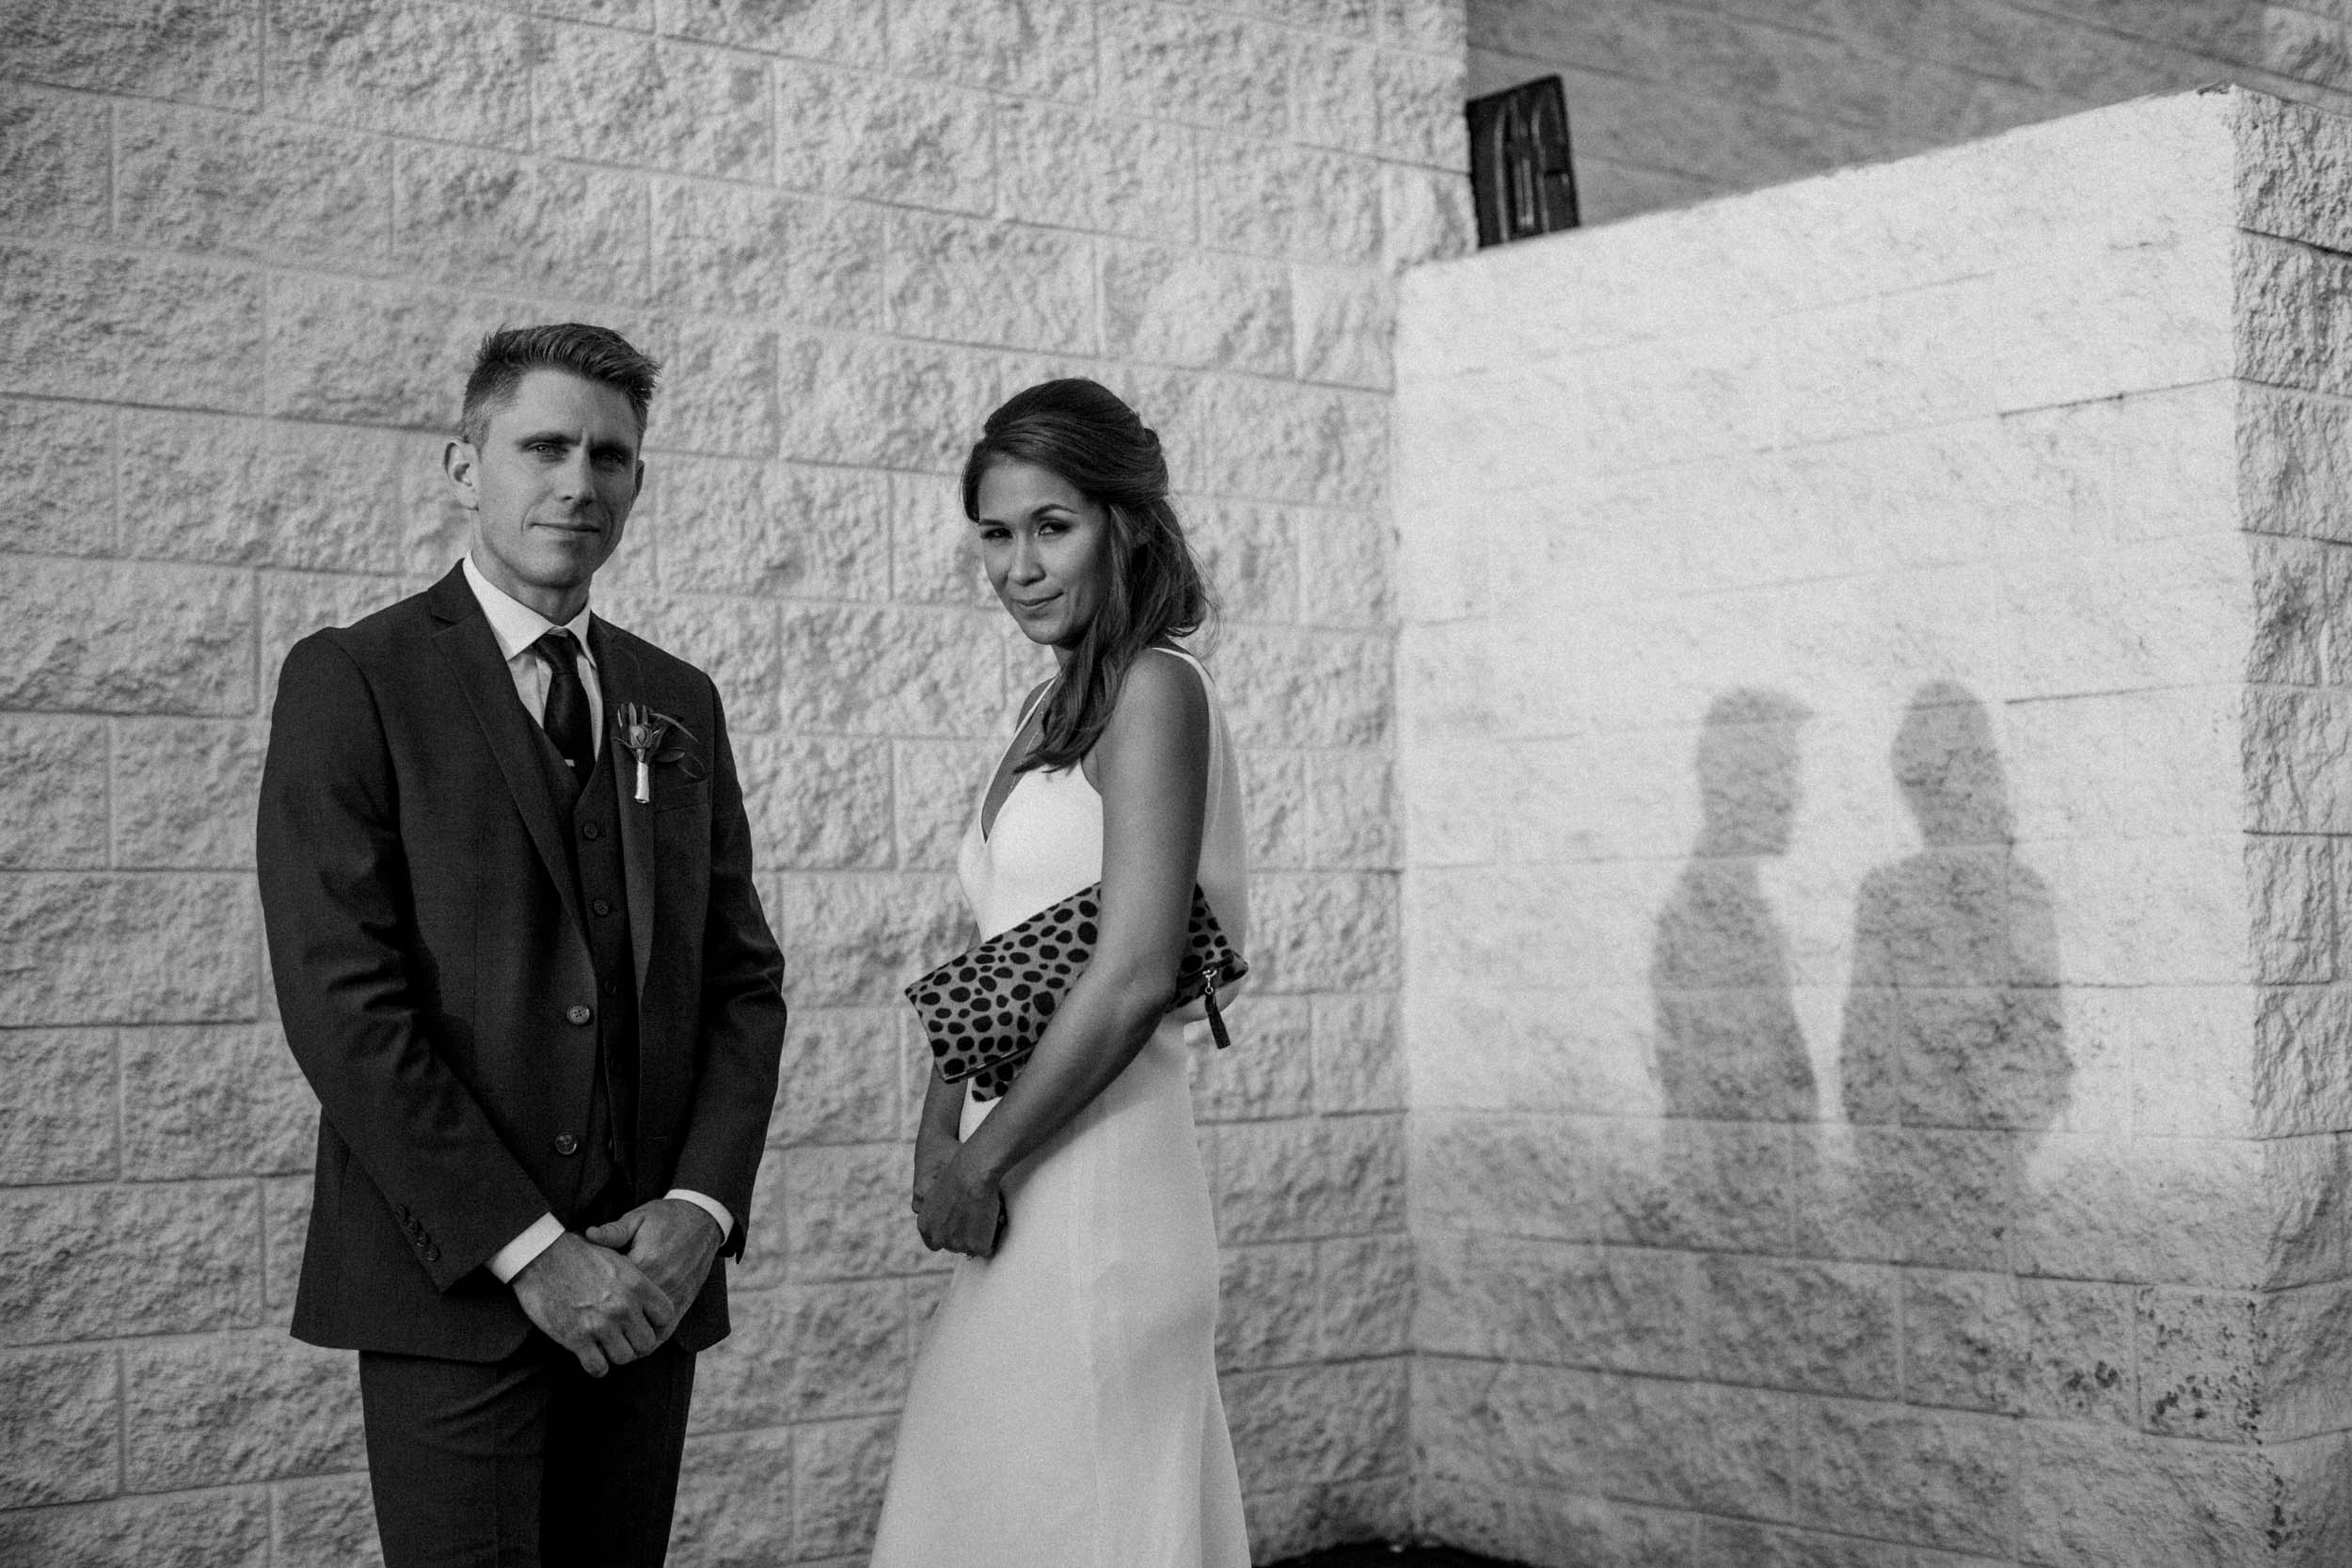 BKM-Photography-Highland-Park-Los-Angeles-Backyard-Wedding-0050.jpg